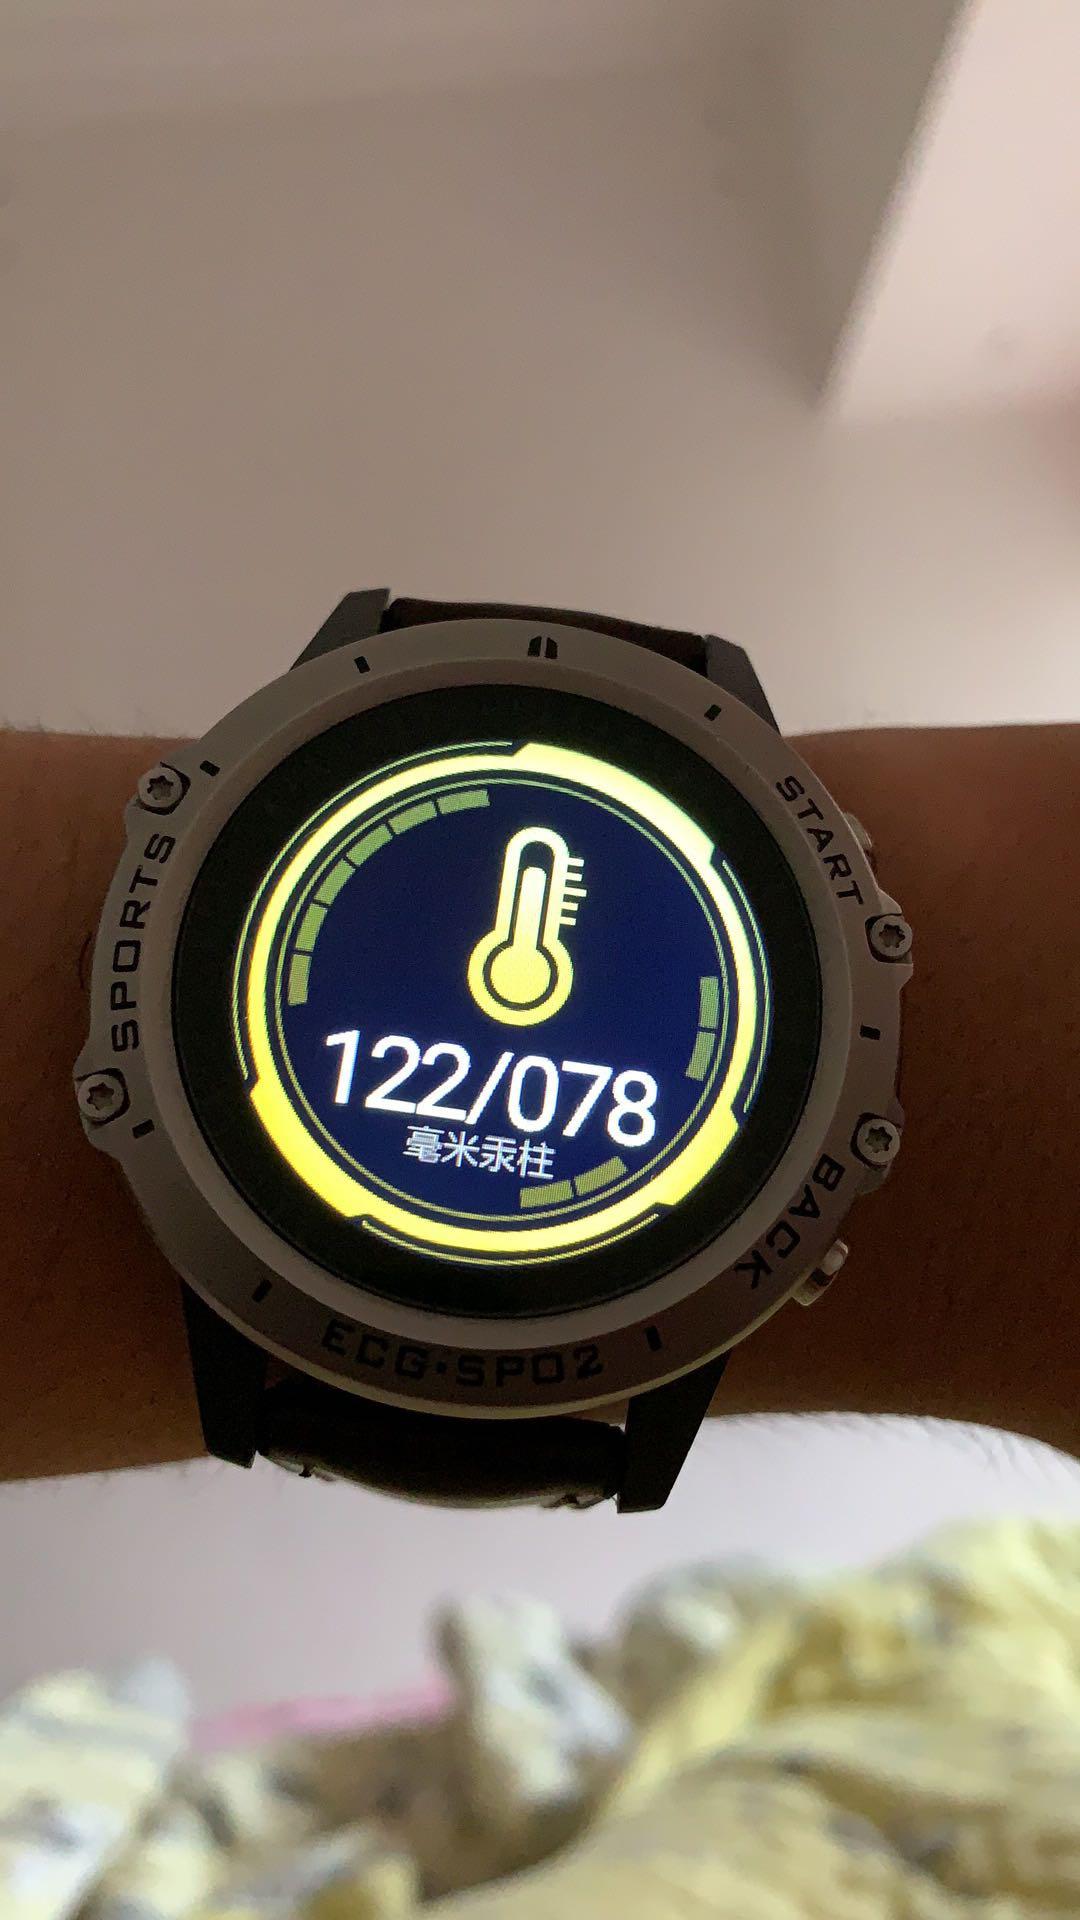 P8 smart Watch